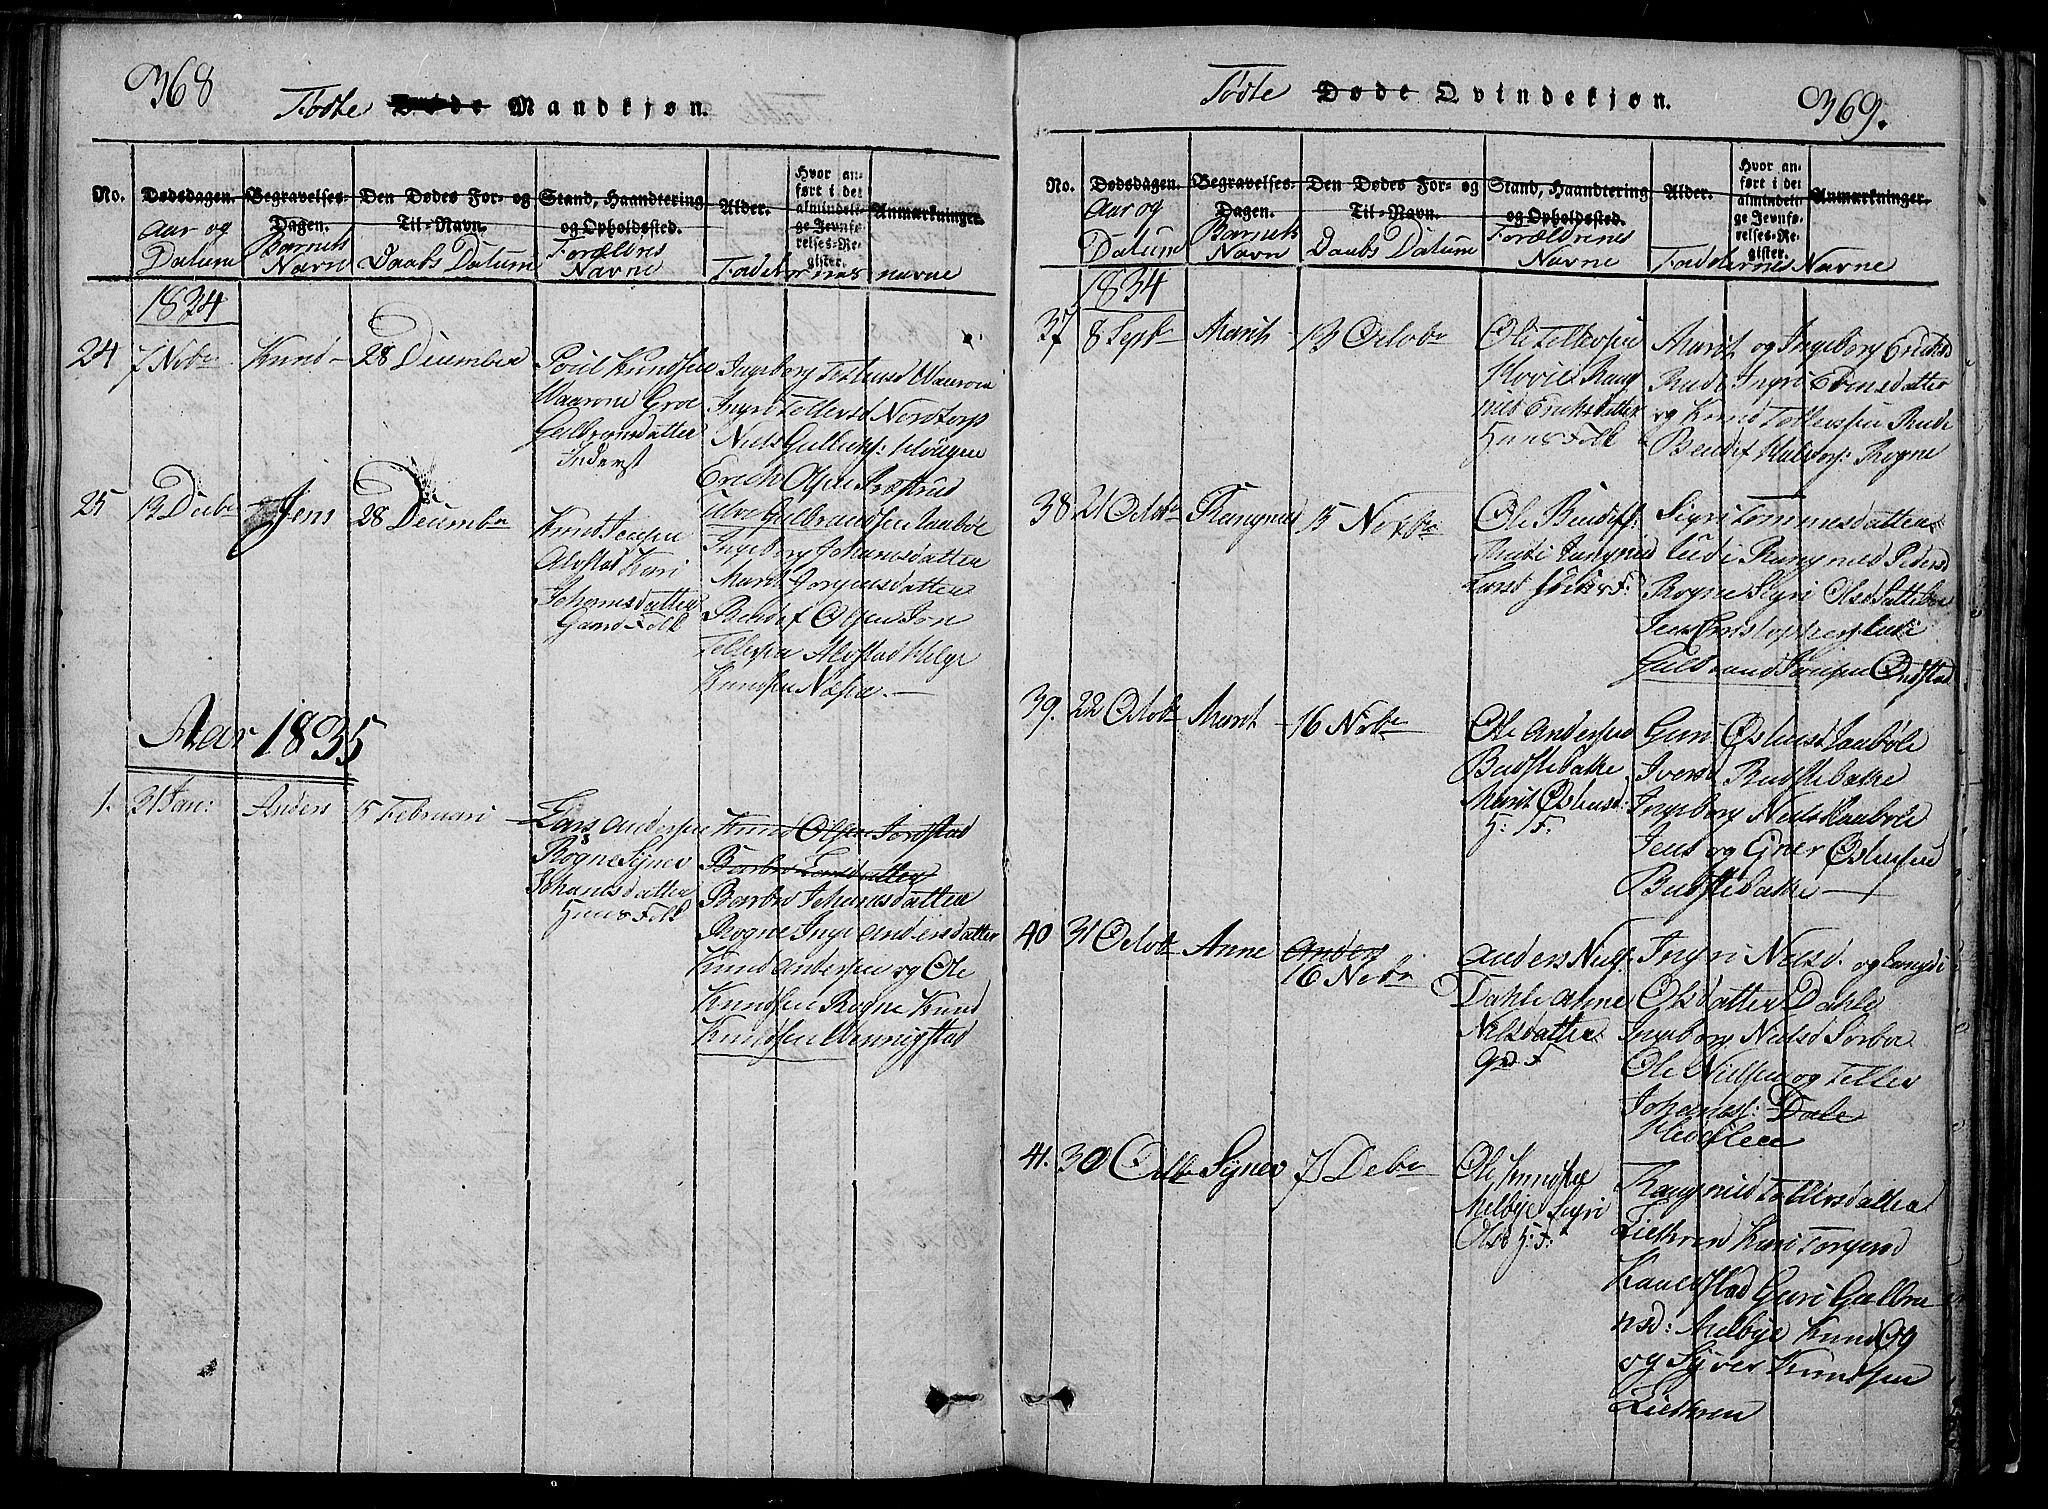 SAH, Slidre prestekontor, Klokkerbok nr. 2, 1814-1839, s. 368-369